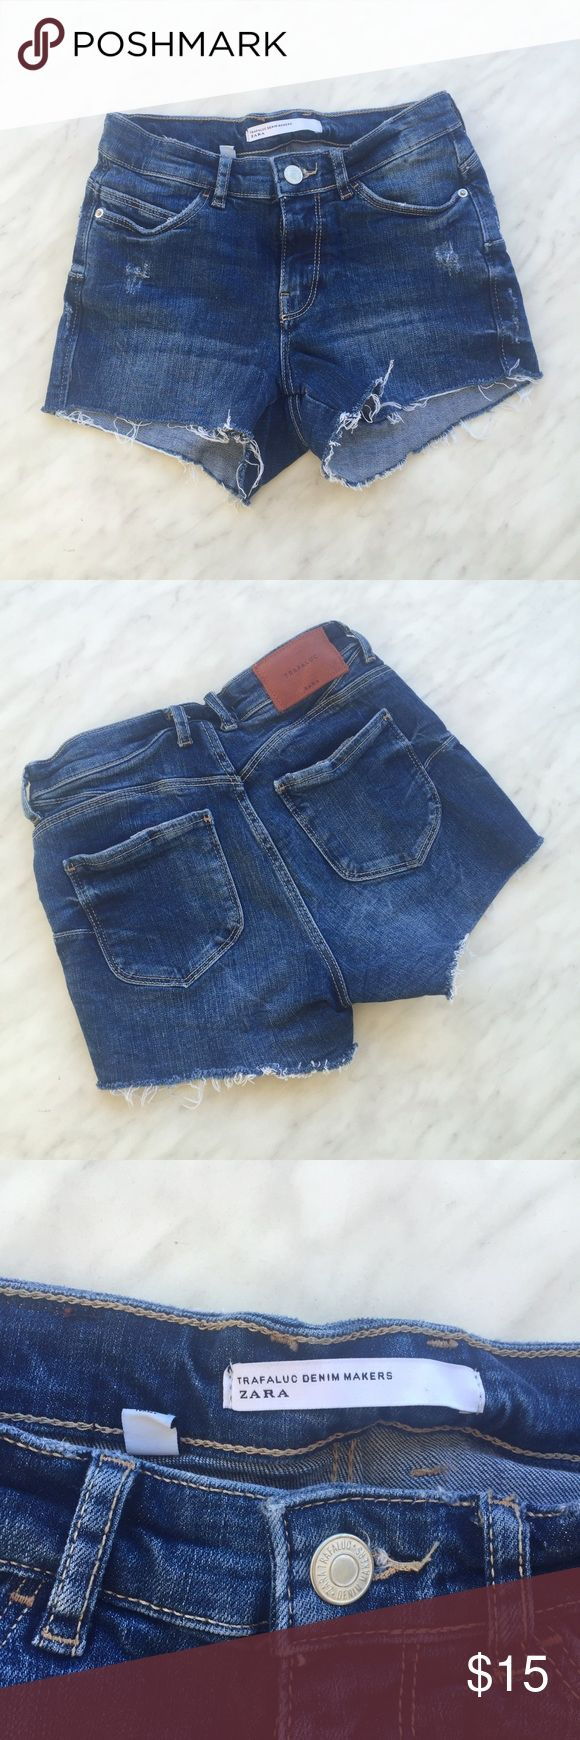 "Zara shorts ""trafaluc"" dark wash 🐳 distressed denim shorts 🐳Dark wash  🐳size double zero 🐳high waisted 🐳Perfect for a warm day or a beach day  💦🐳accepting offers🐳💦 Zara Shorts Jean Shorts"